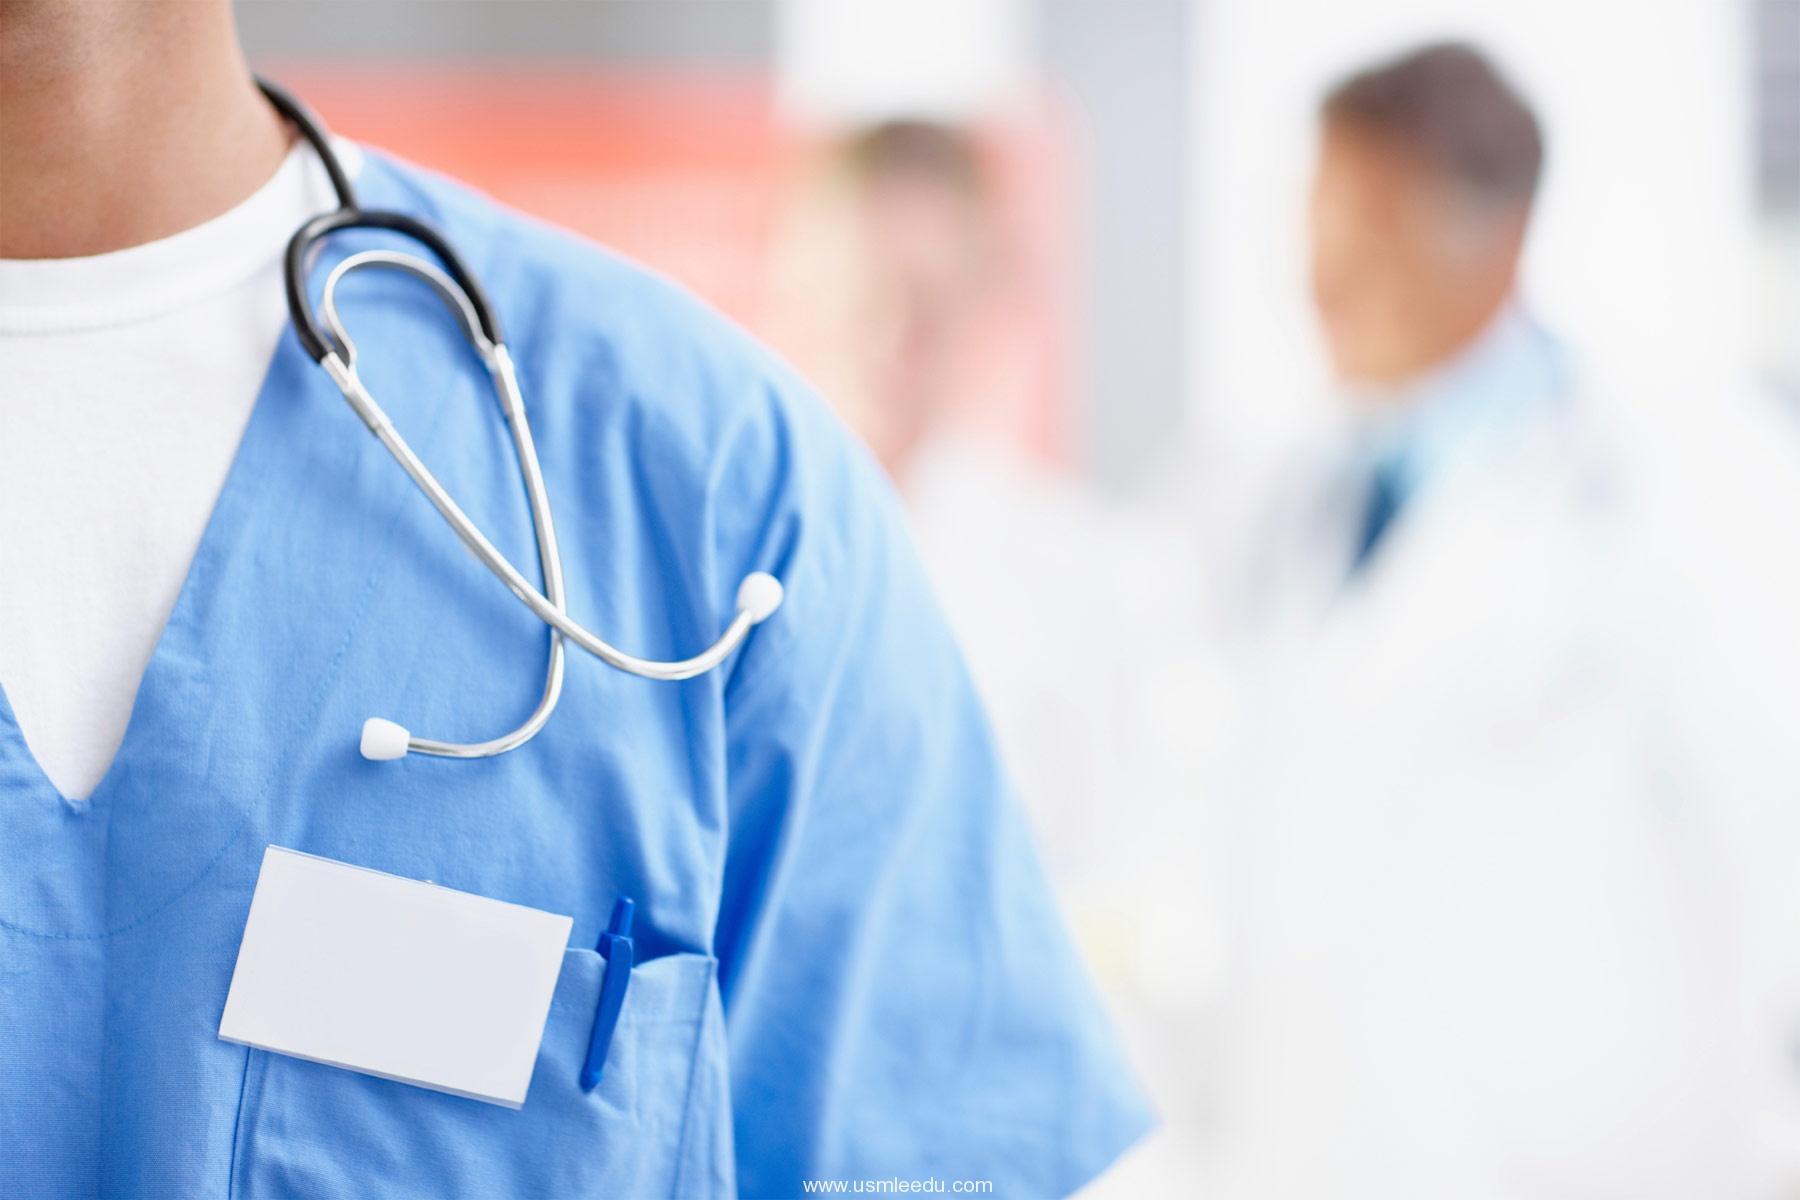 USMLE和住院医师培训项目都是医学质量的保证